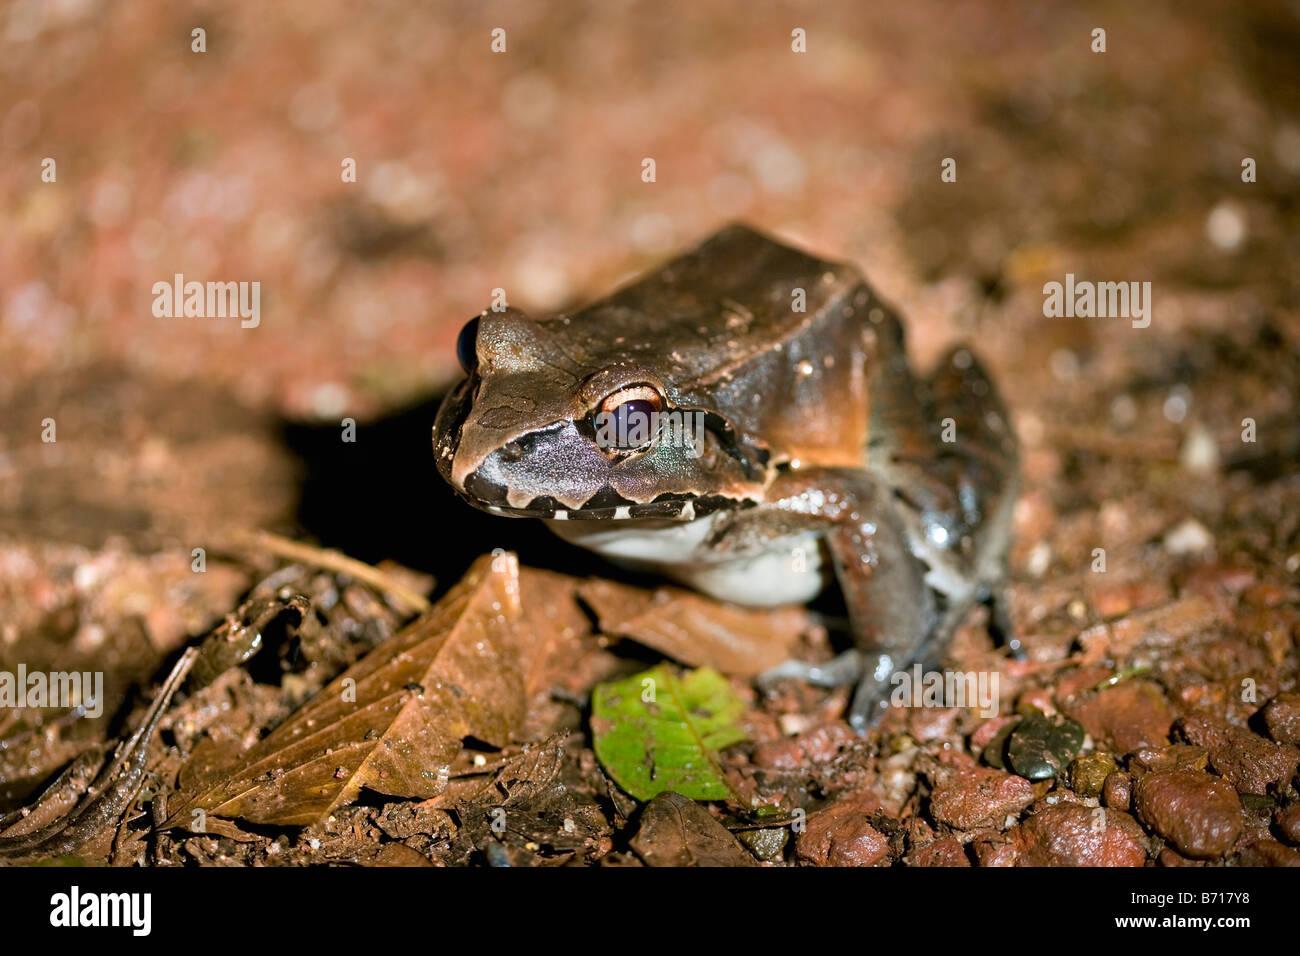 Il Suriname, Brownsweg, Brownsberg Parco Nazionale. Sibilo gigante rana (Leptodactylus pentadactylus.). Immagini Stock